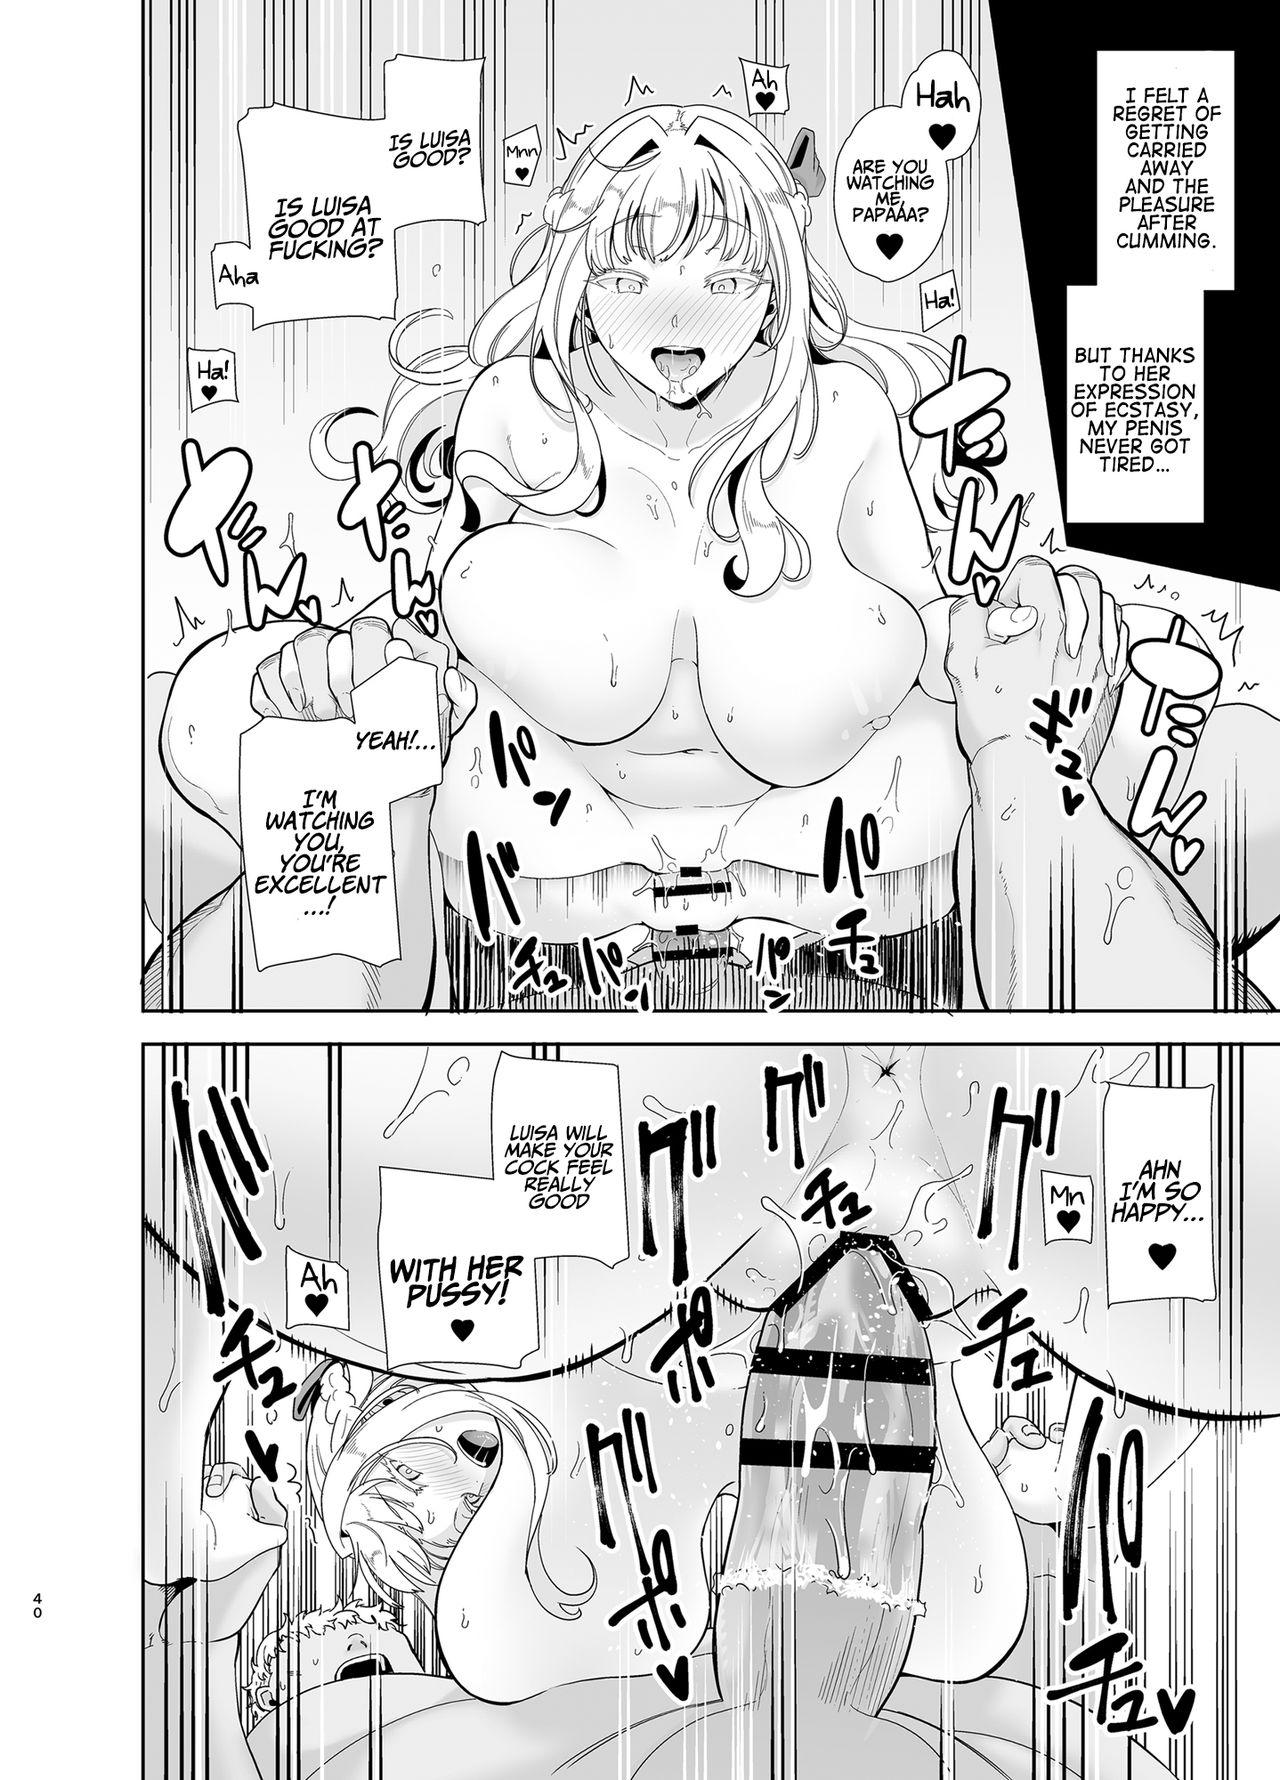 [DOLL PLAY (Kurosu Gatari)] Seika Jogakuin Koutoubu Kounin Sao Oji-san 4 | Seika Girls' Academy High School's Official Rod Oji-san 4 [English] [Coffedrug] [Digital] 38